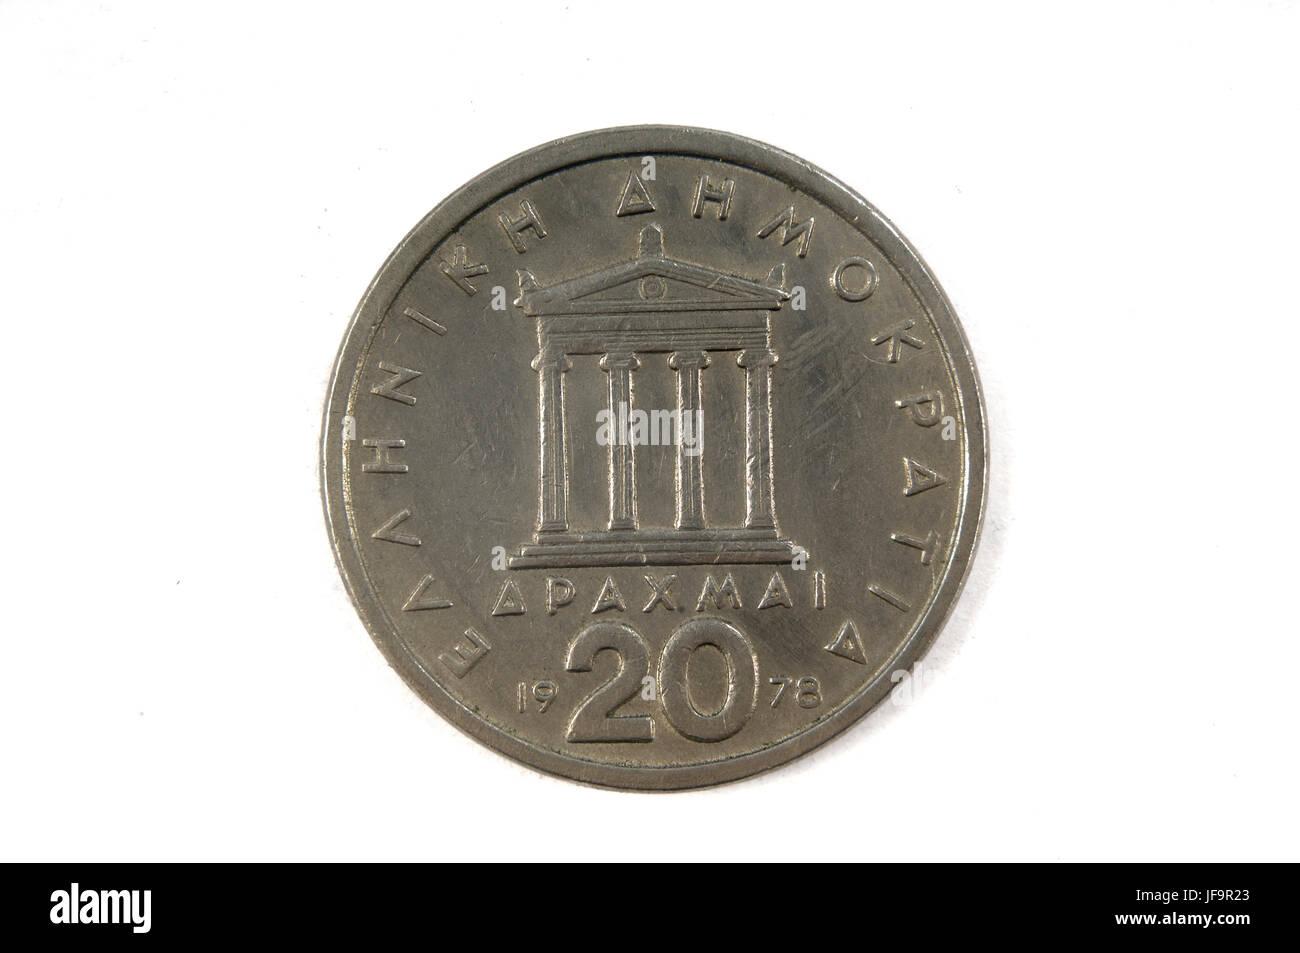 Greek Drachma Coin, 20 drachmas 1978 - Stock Image